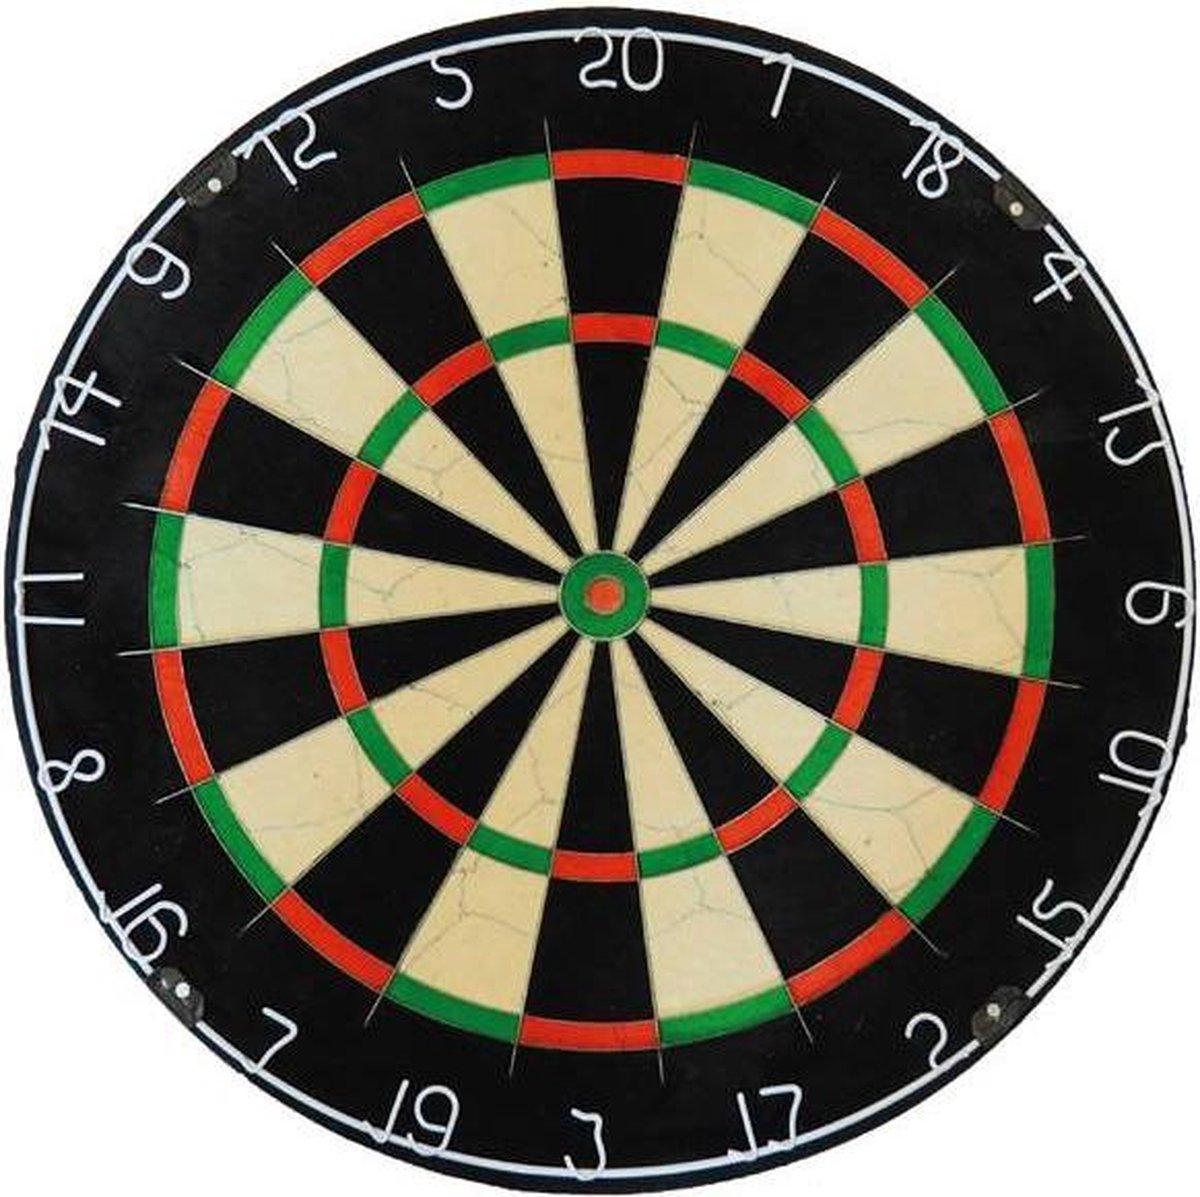 A-merk Dragon Darts Plain Bristle - dartbord - Top kwaliteit - Best geteste - dartborden